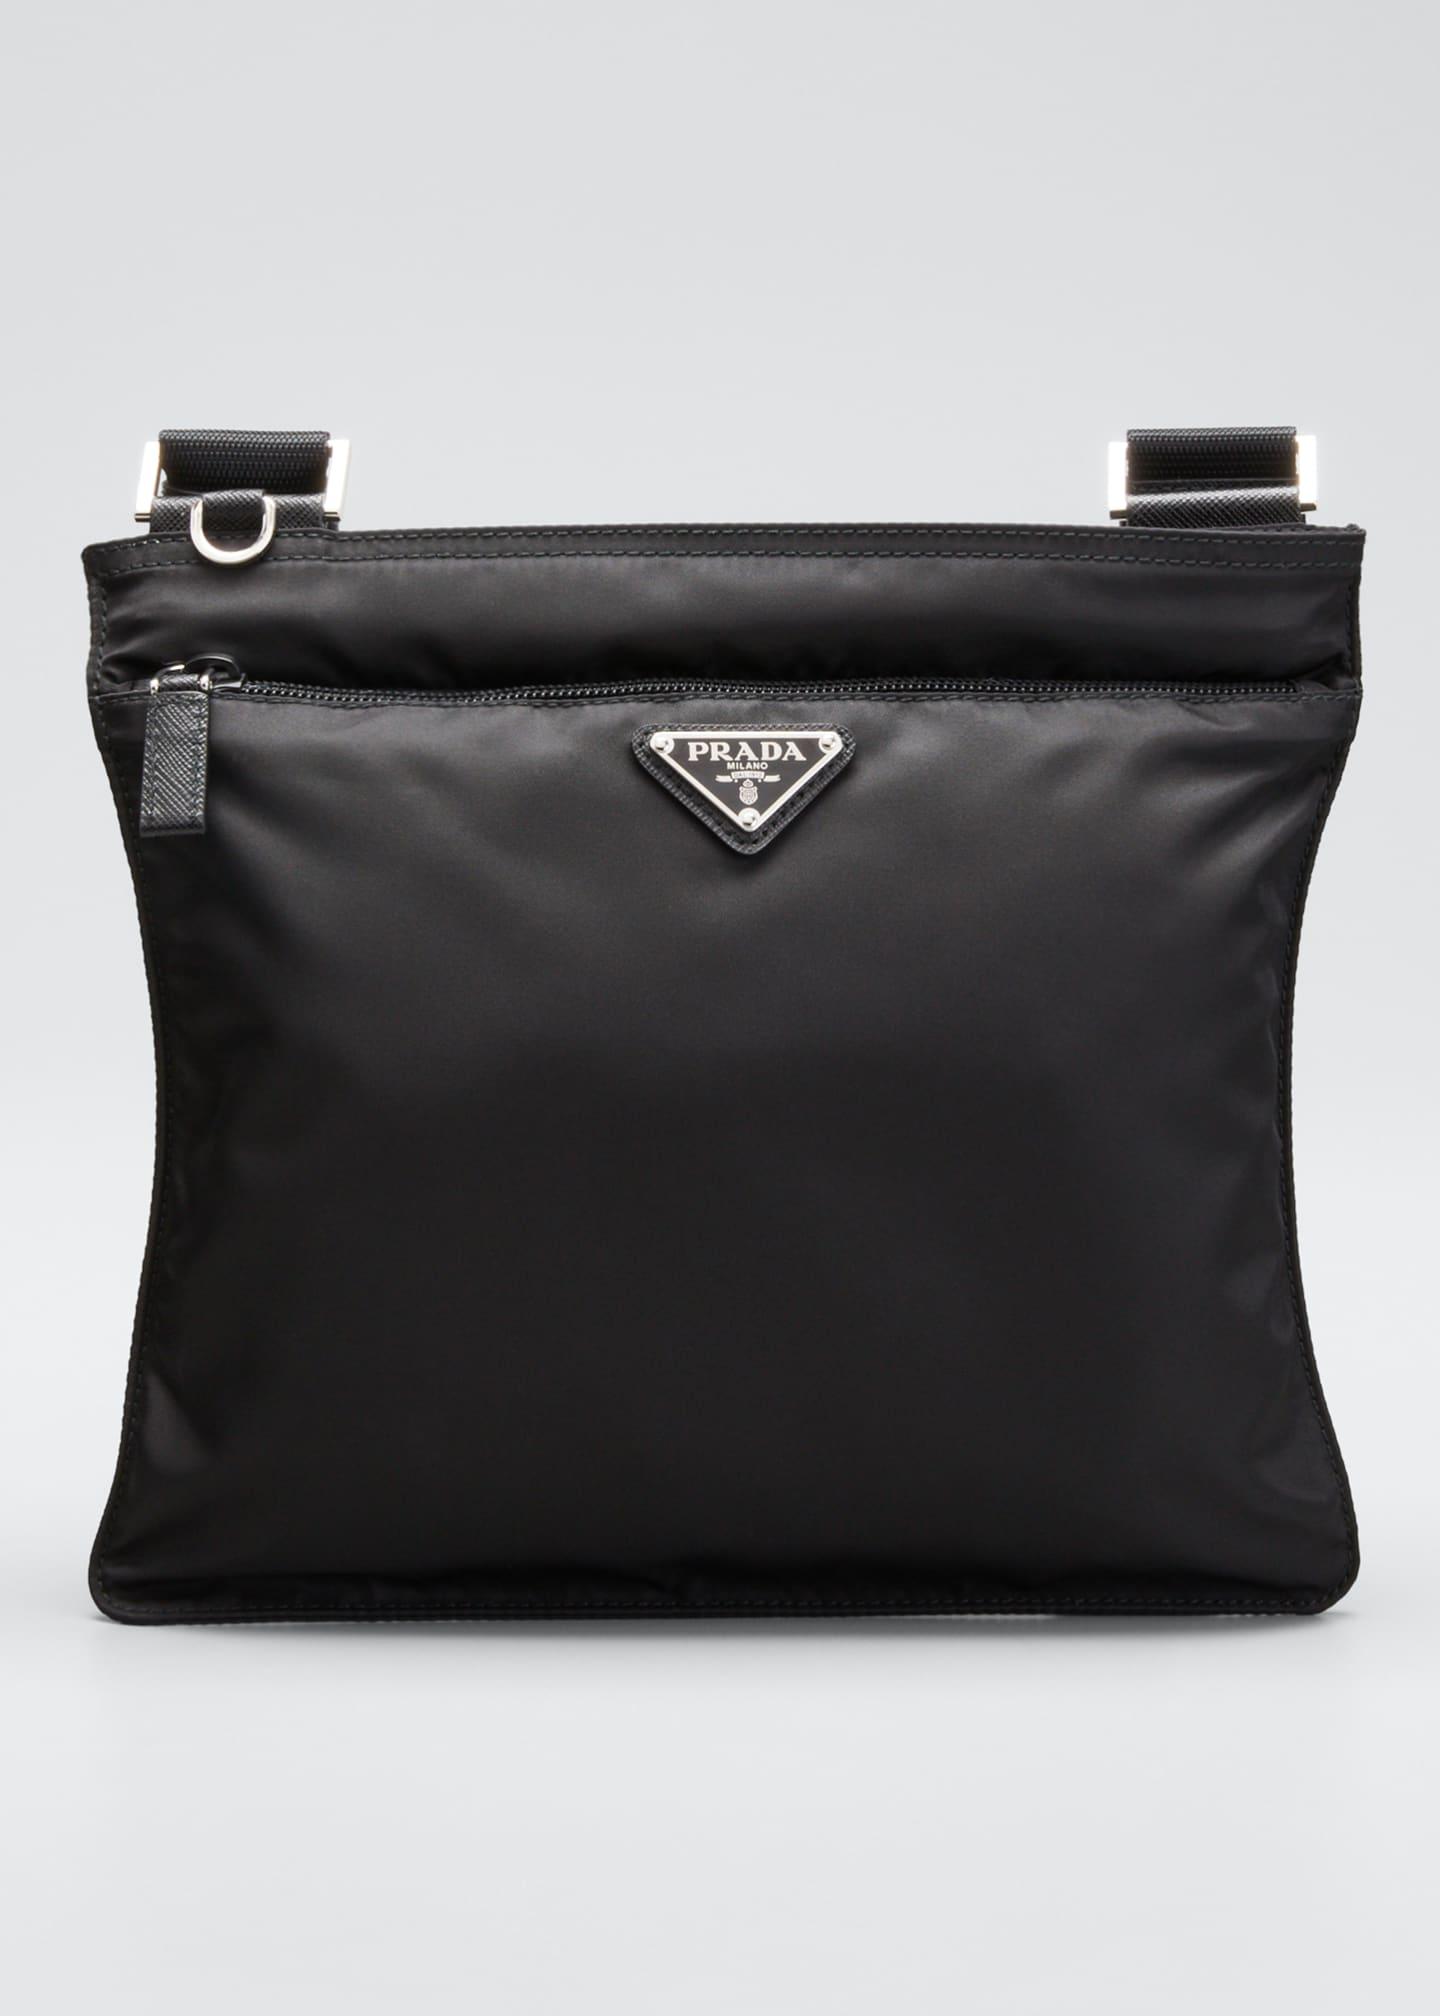 Prada Vela Flat Crossbody Bag, Black (Nero)